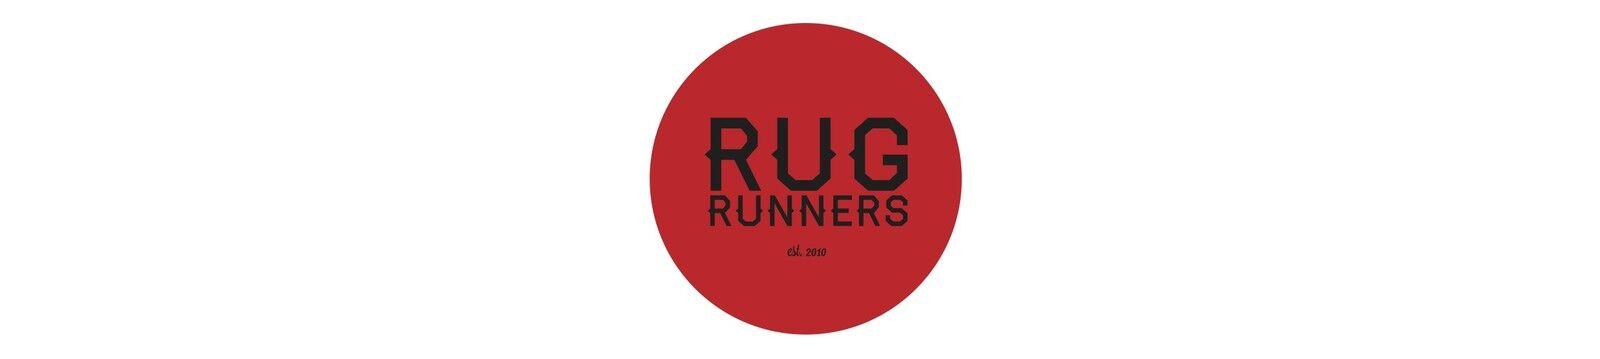 rugrunners24